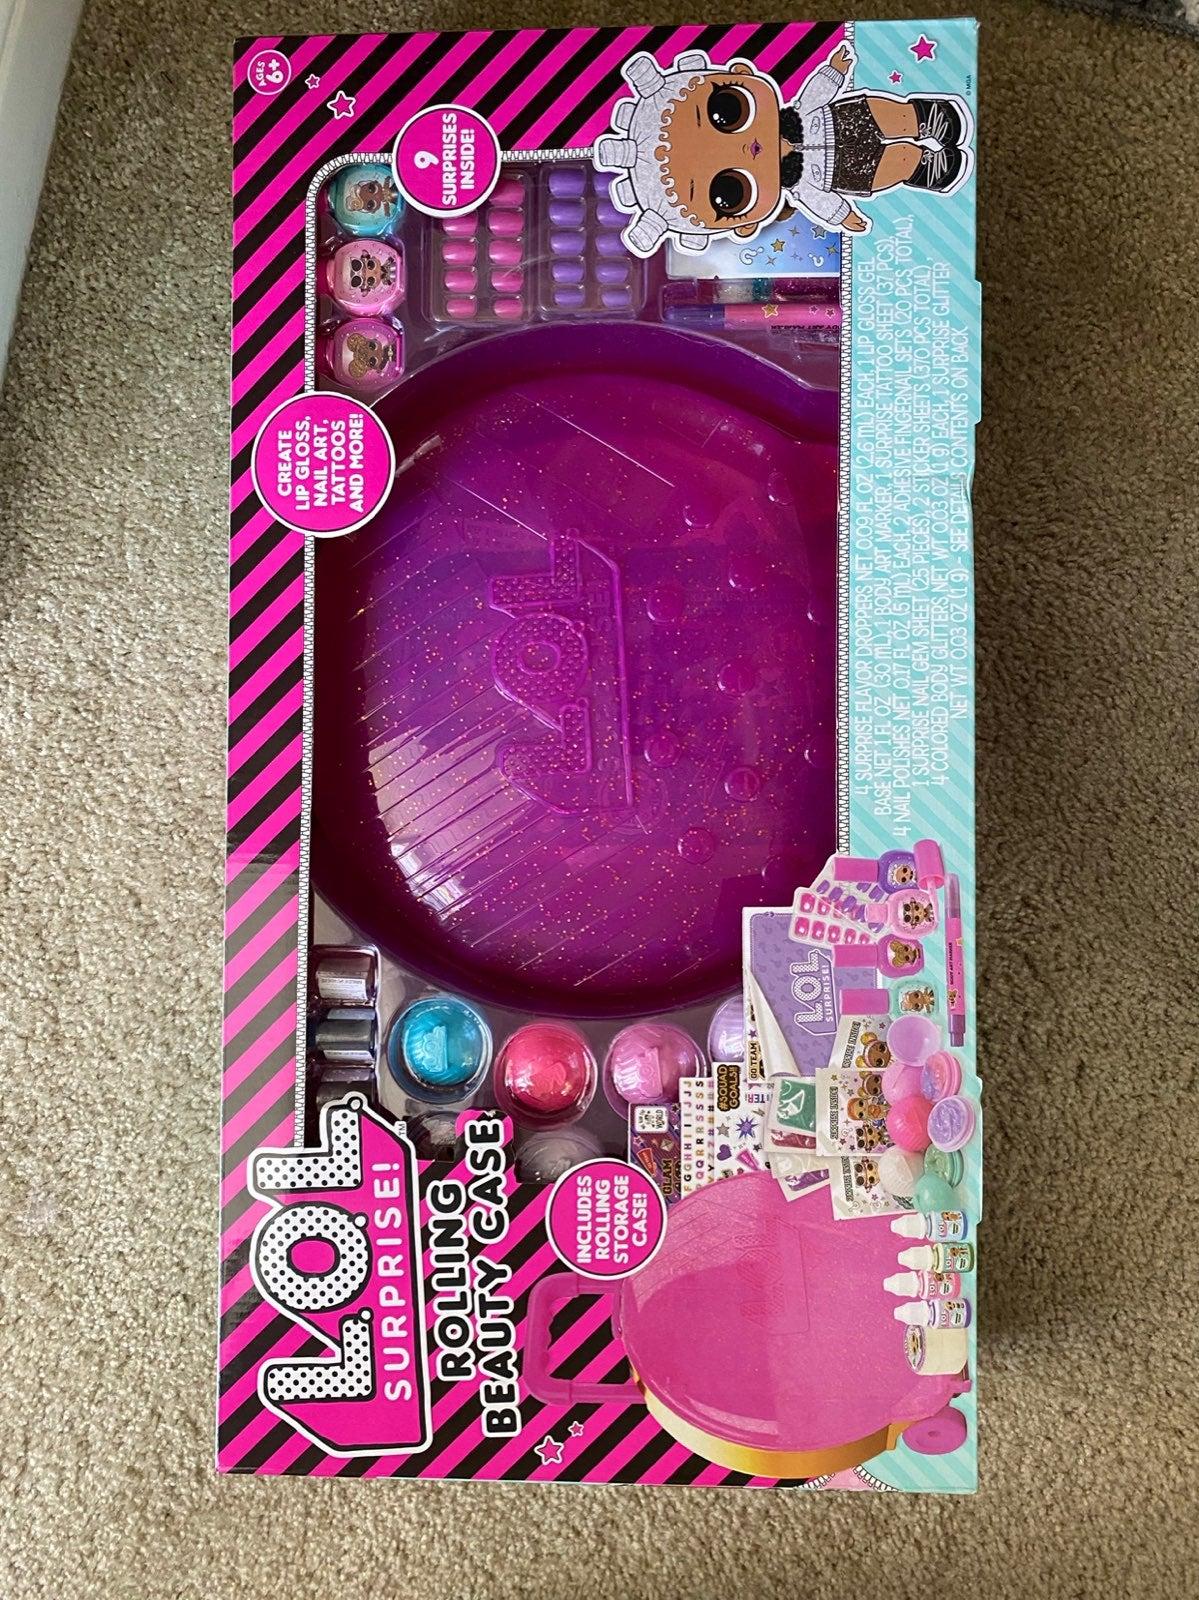 New LOL toy